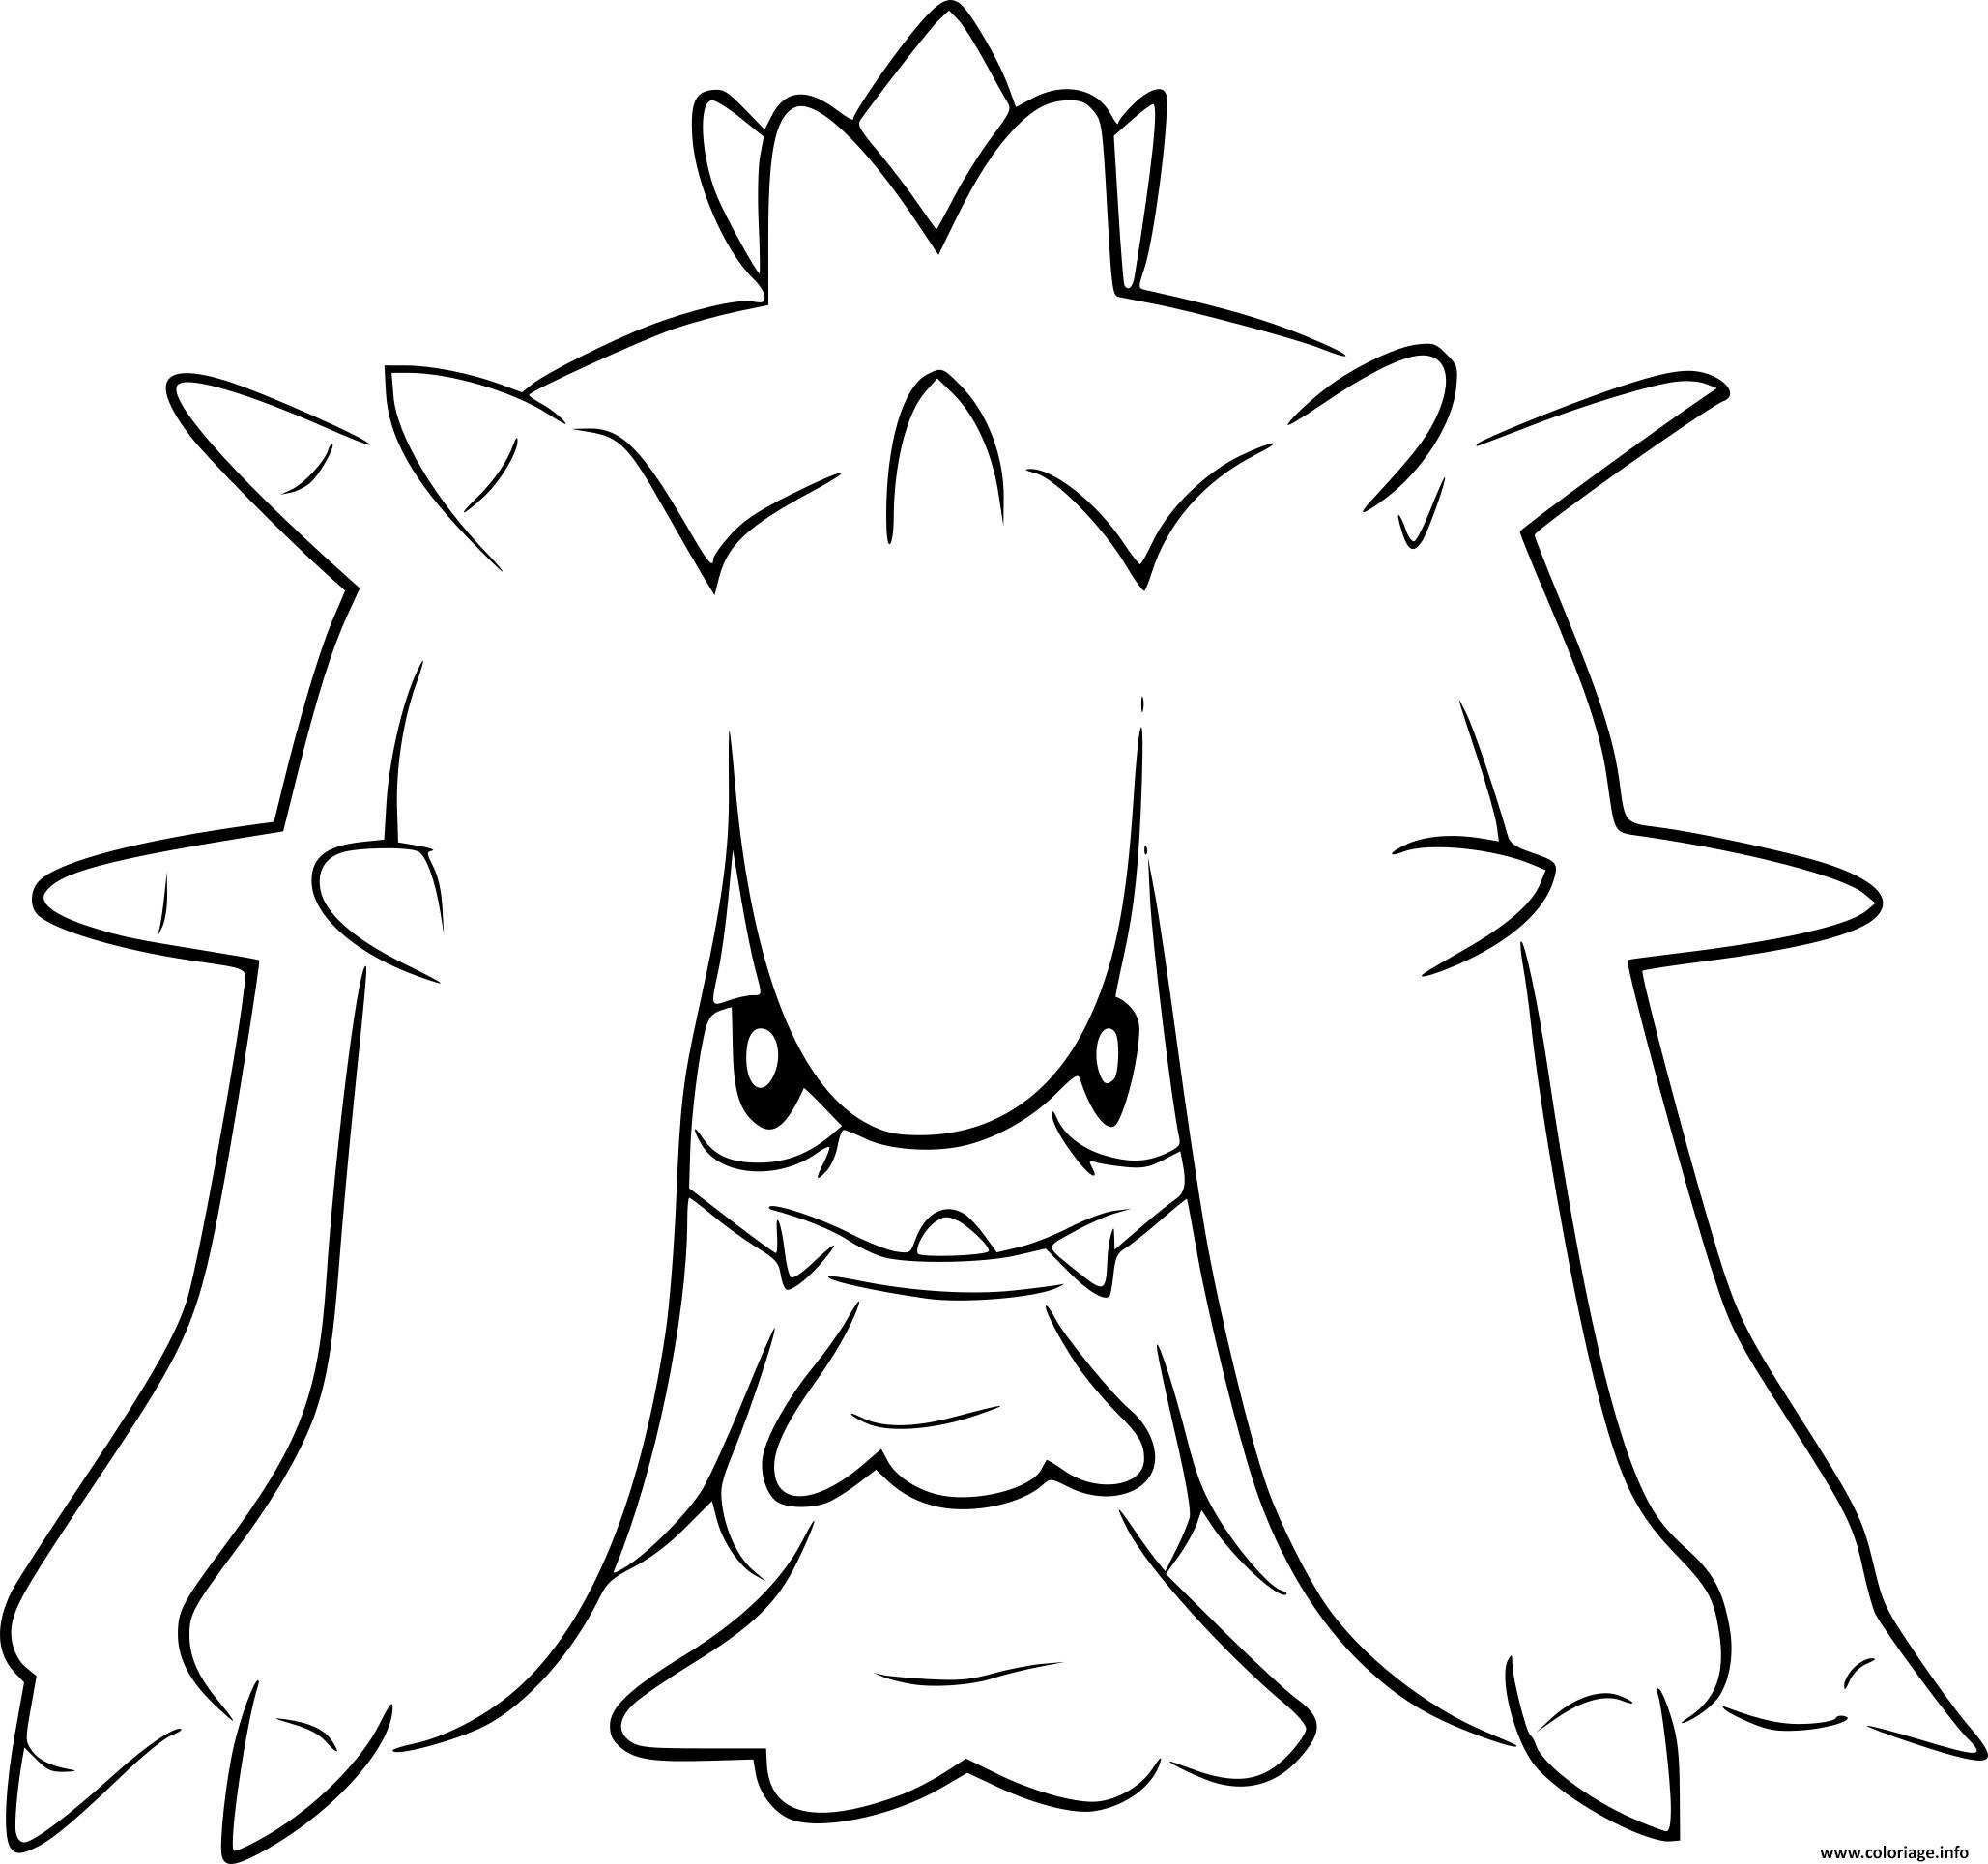 Luxe Image Pokemon A Imprimer En Couleur Mademoiselleosaki Com